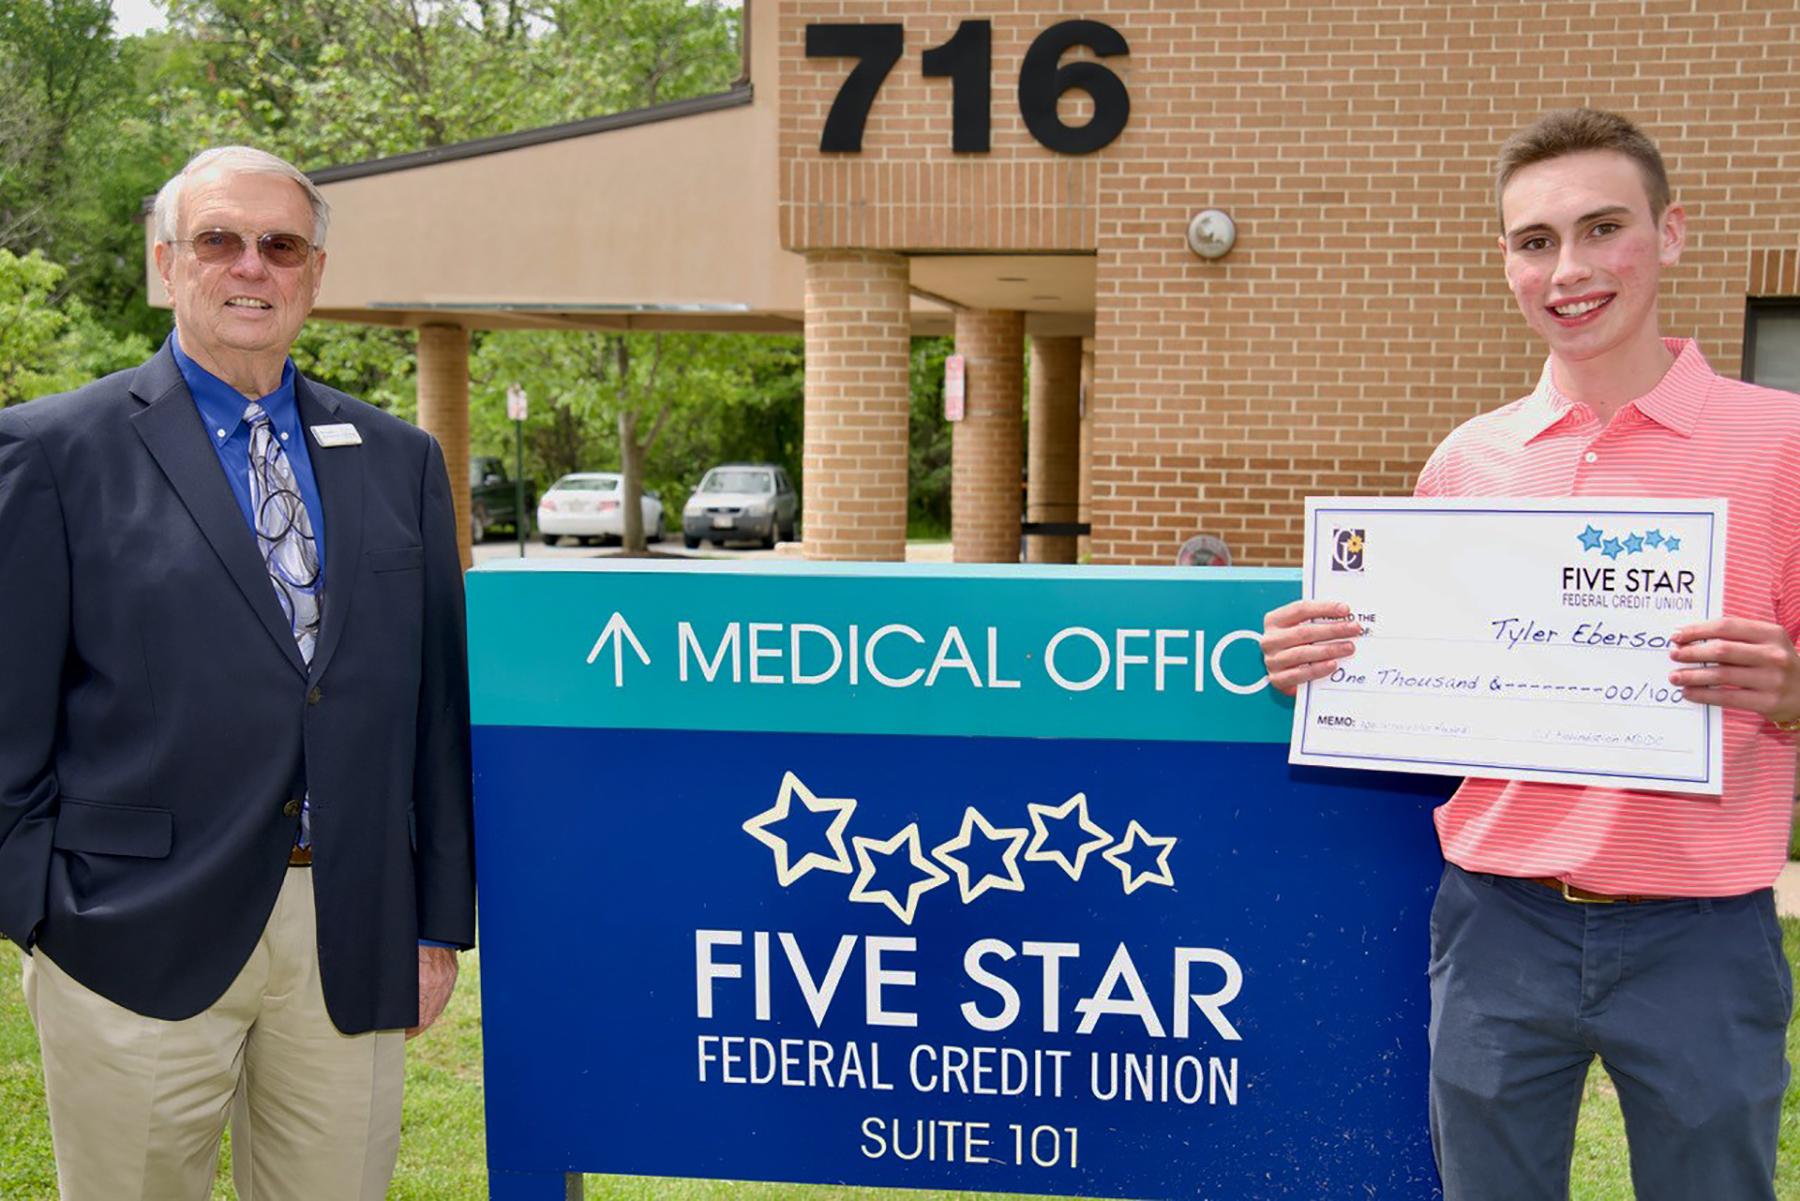 Paul Coakley presents a CU Foundation scholarship check to Tyler Ebersole.